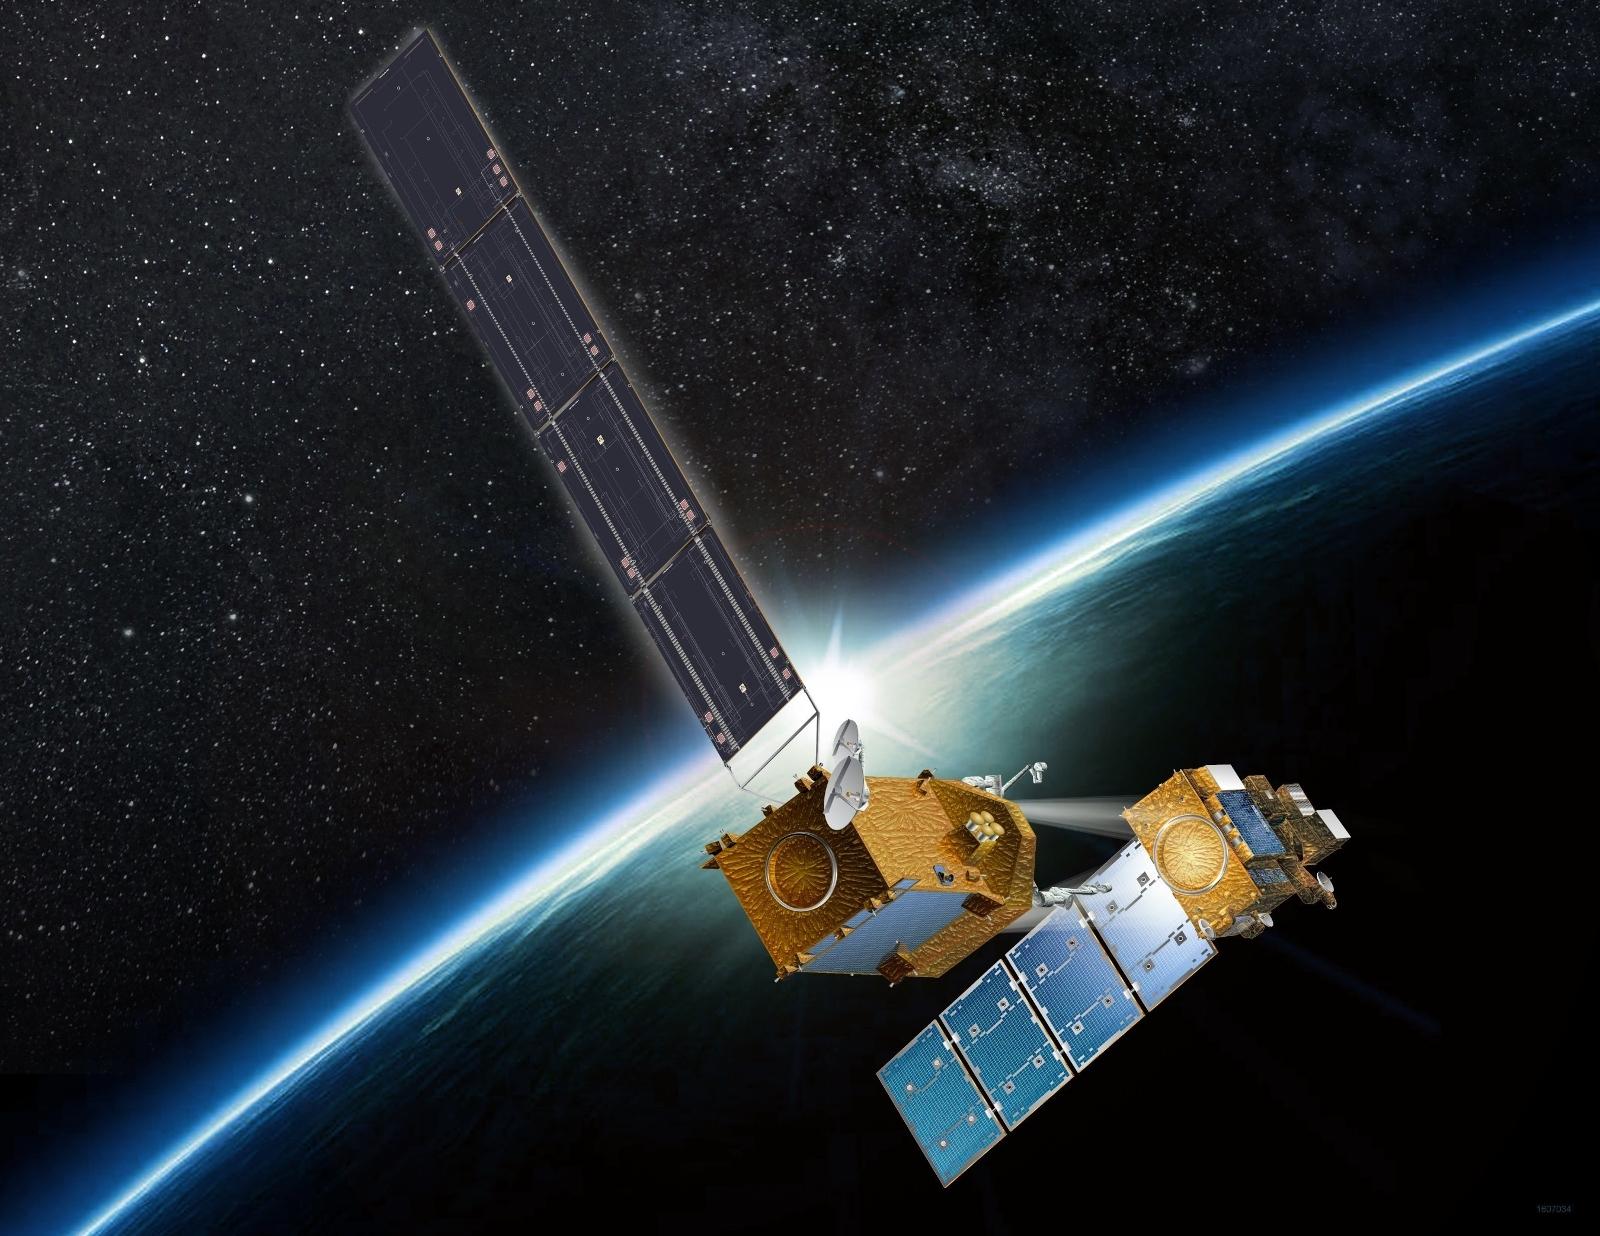 Httpsroboticsandautomationnews20161212robomotion and nasa ssl robotic spacecraft to fix satelliteseg fandeluxe Choice Image